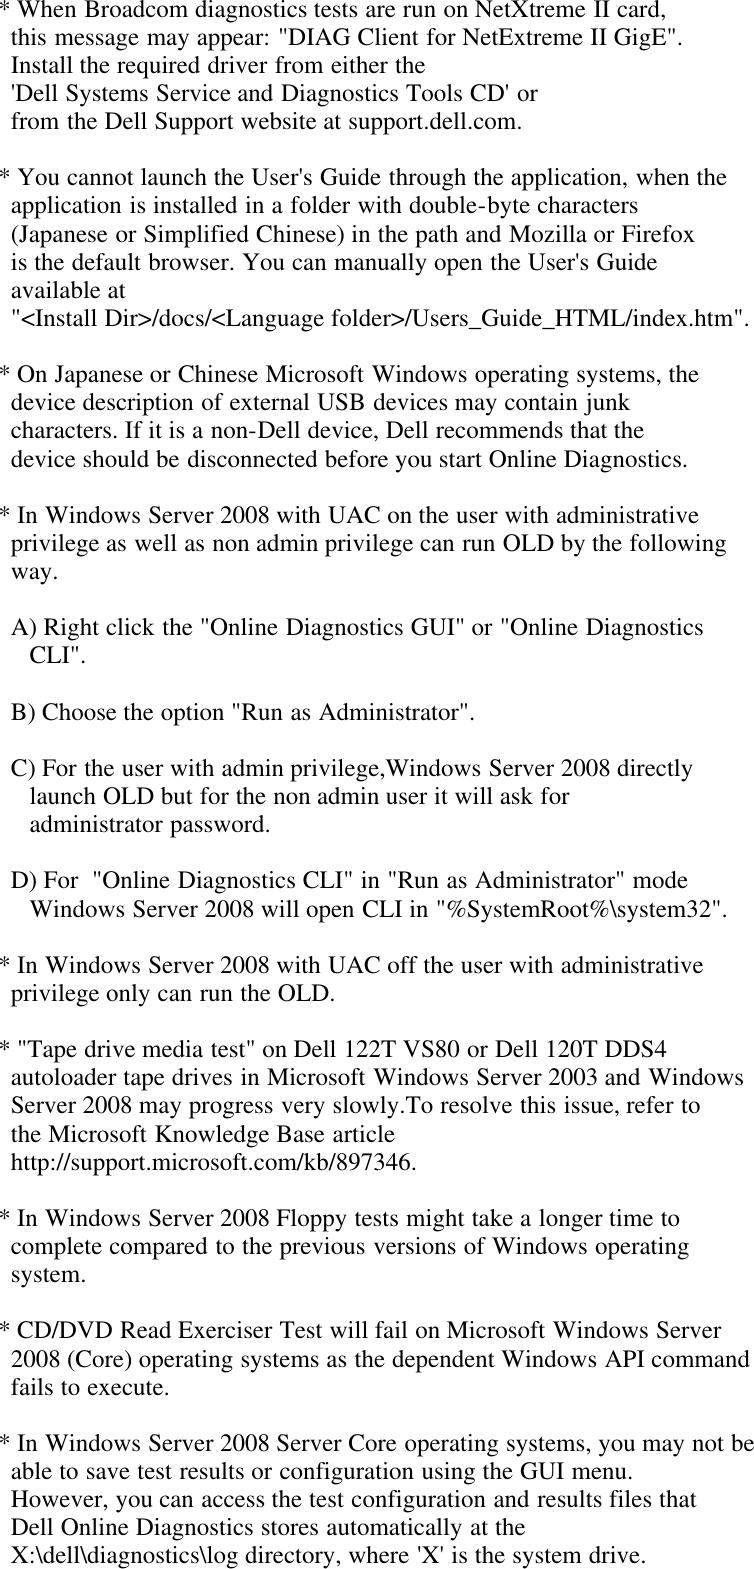 Dell Online Diagnostics Version 2 17 Owners Manual 2 17 Readme